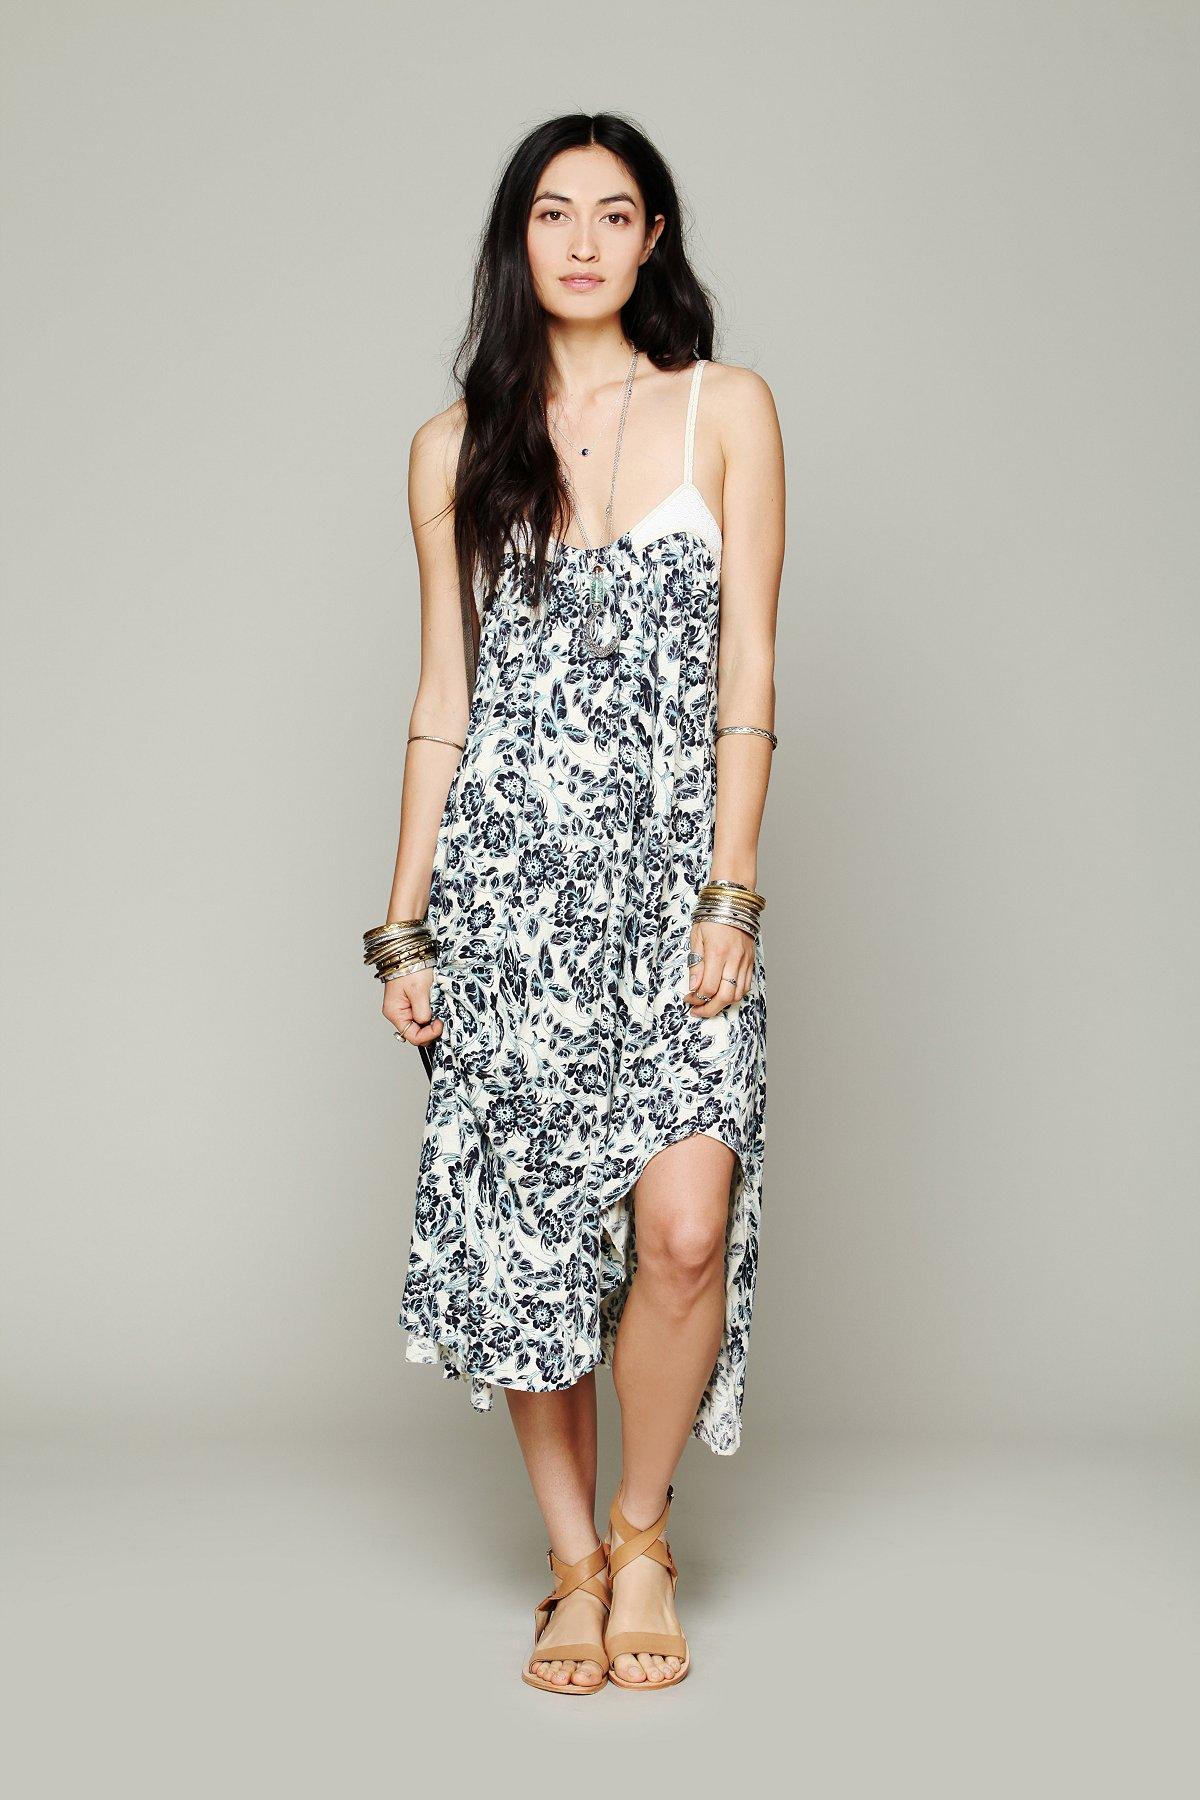 FP New Romantics Echo Me Floral Dress